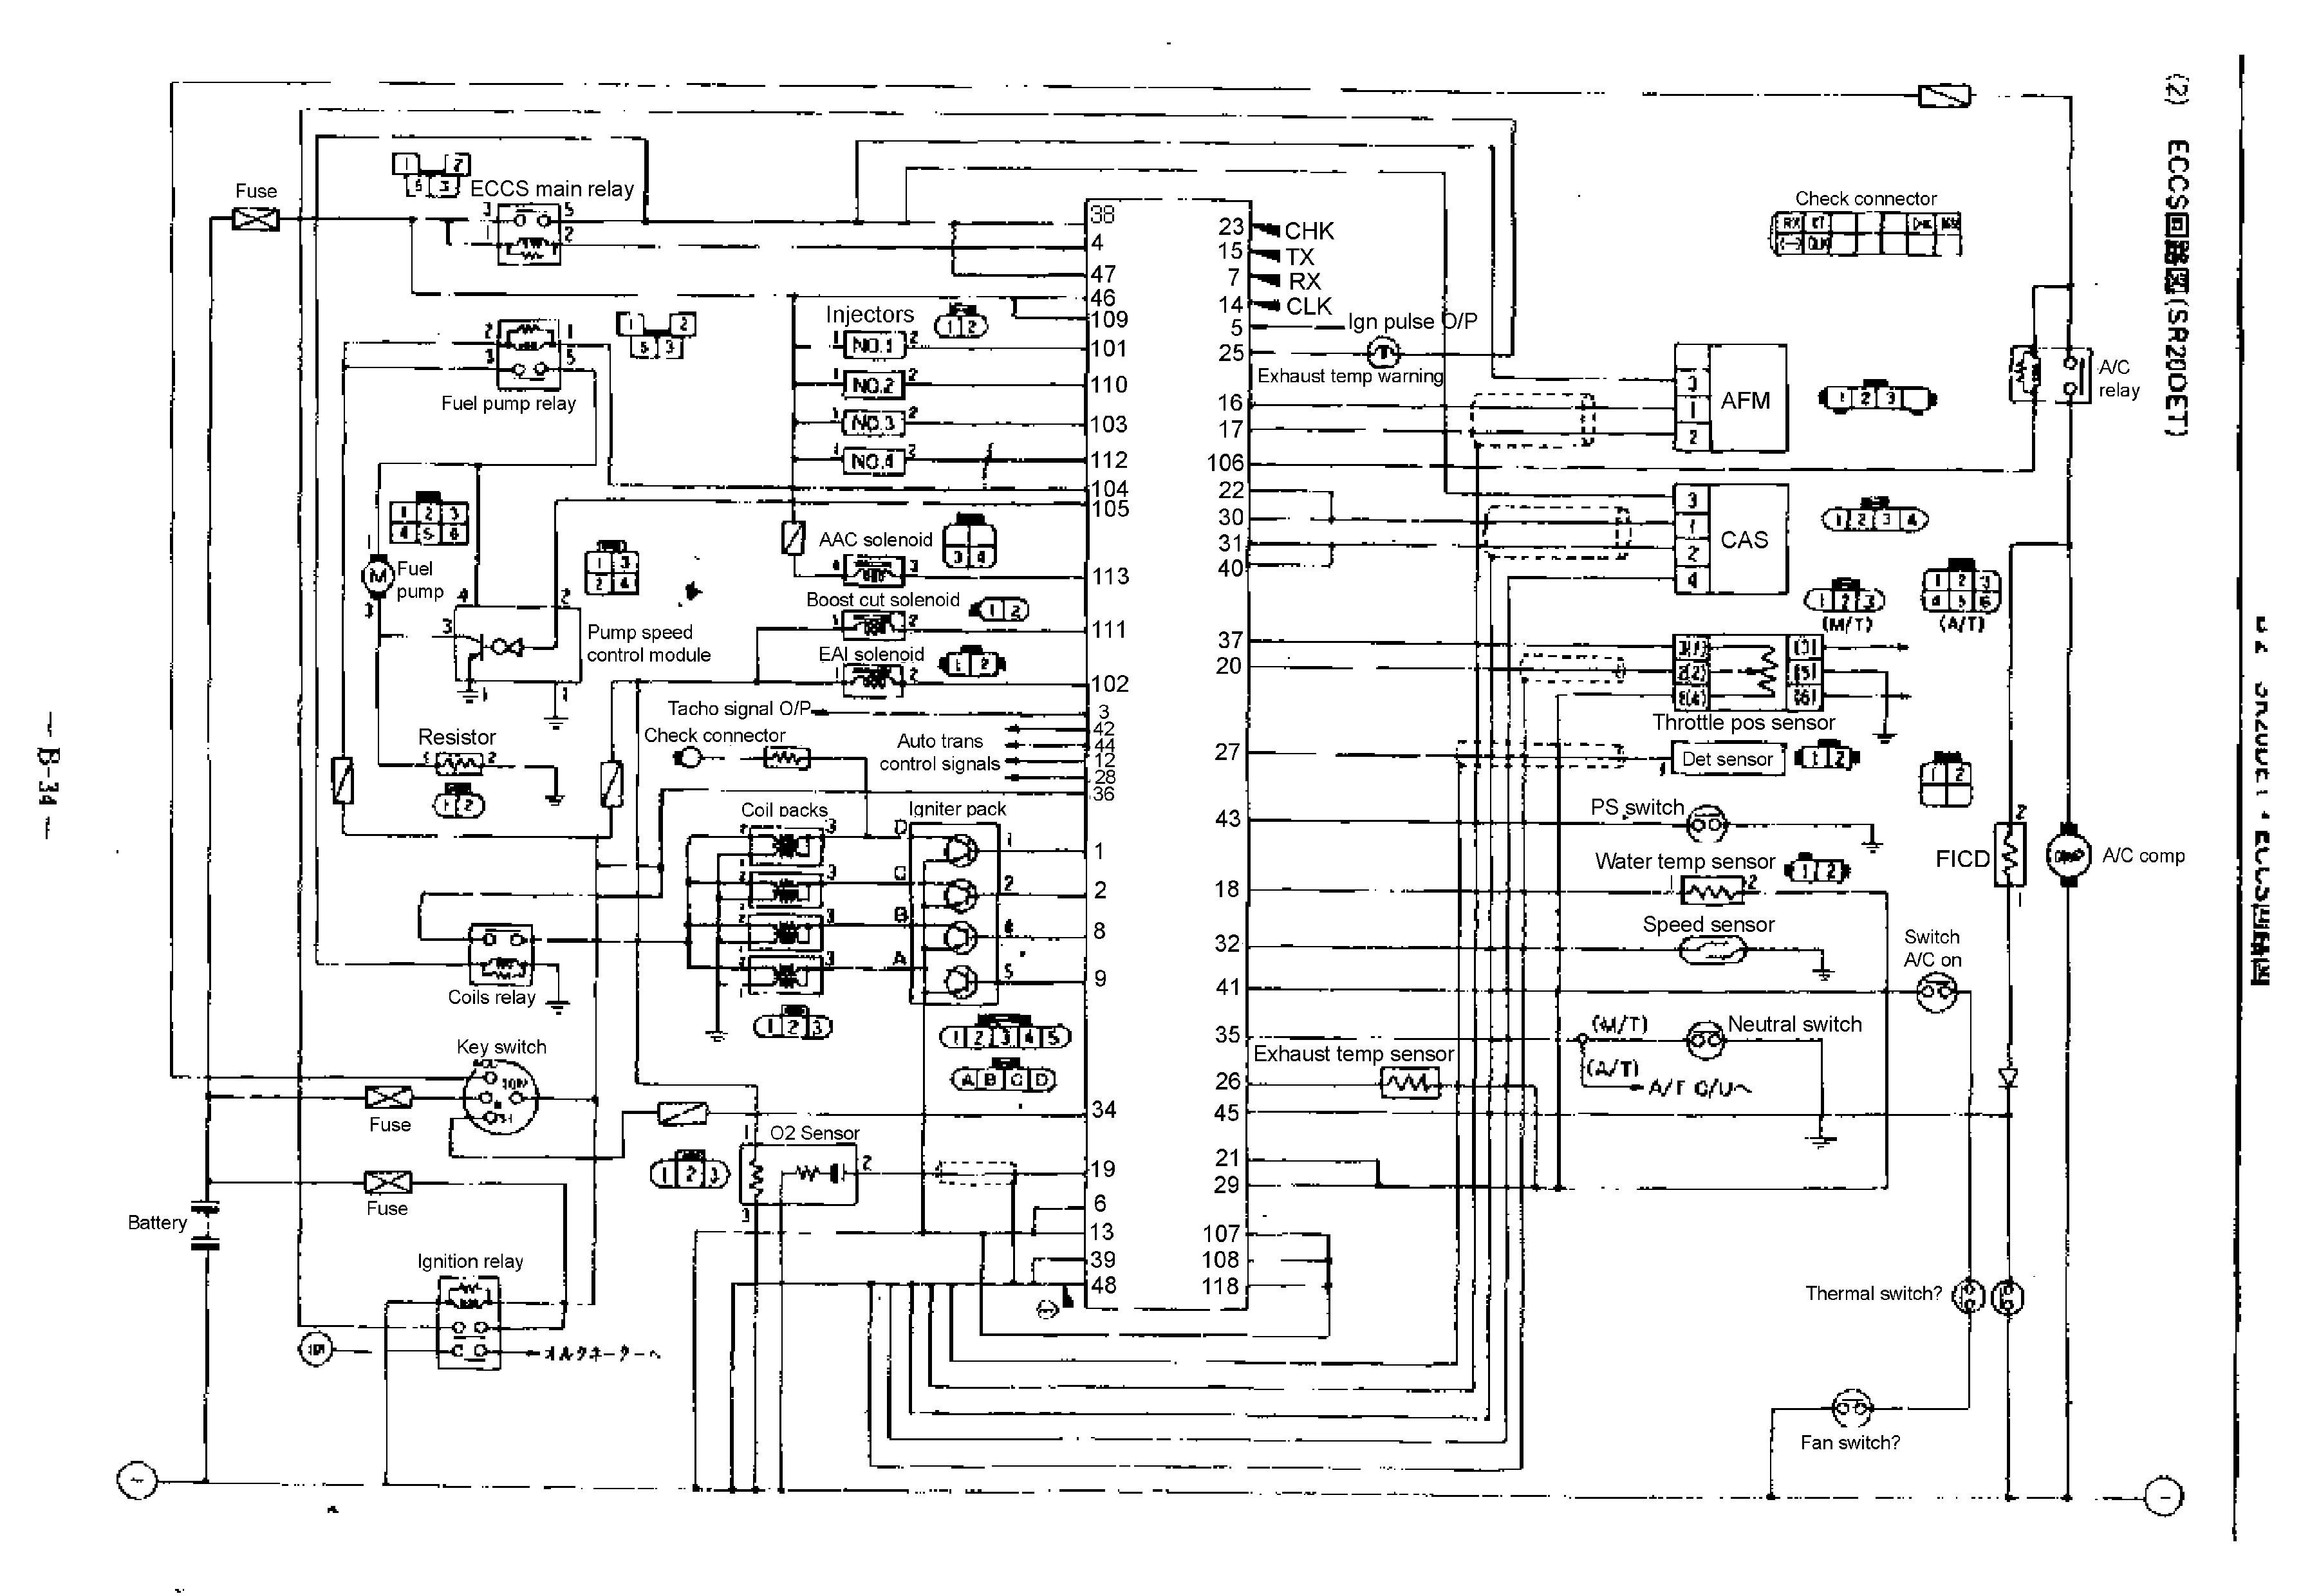 [ZHKZ_3066]  Thomas Buses Wiring Diagrams 1995 Honda Seat Wiring -  podewiring.durian.astrea-construction.fr | 2007 Thomas C2 Brake Wiring Diagram |  | ASTREA CONSTRUCTION